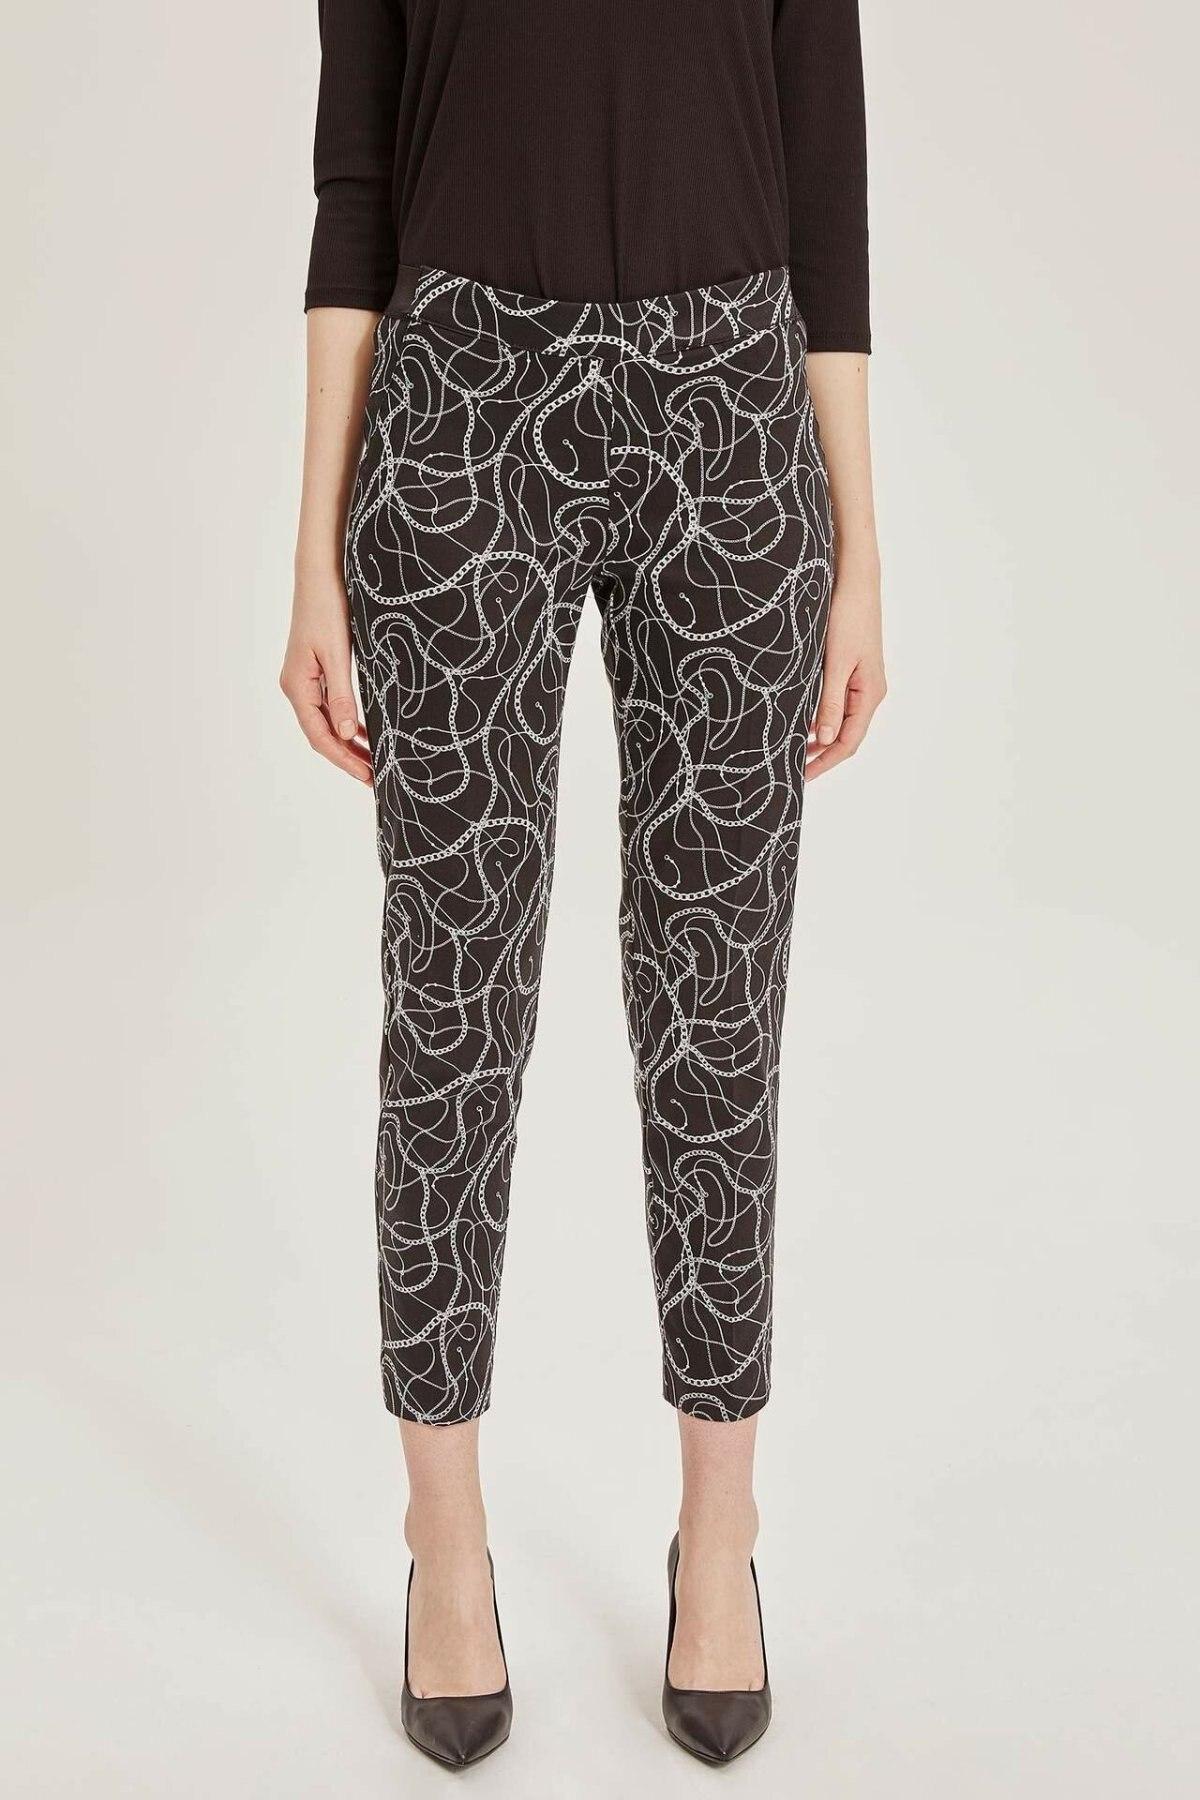 DeFacto Woman Spring Chain Prints Dark Long Pants Women Ninth Pants Female Pencil Pant Bottoms Trousers-K8594AZ19SP